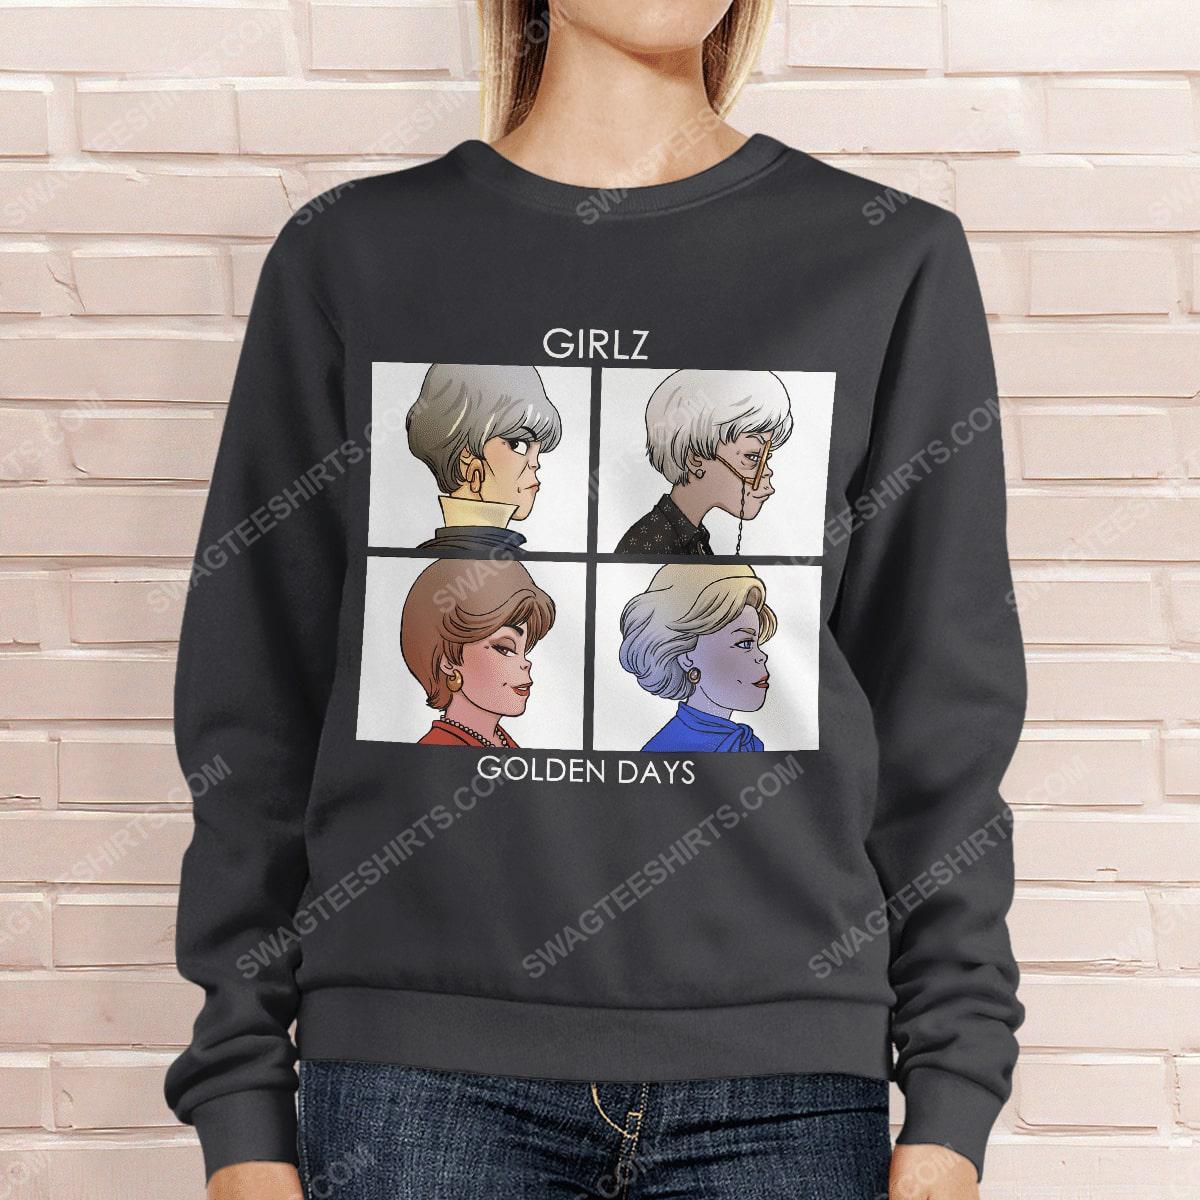 Vintage girlz golden days the golden girls sweatshirt 1(1)